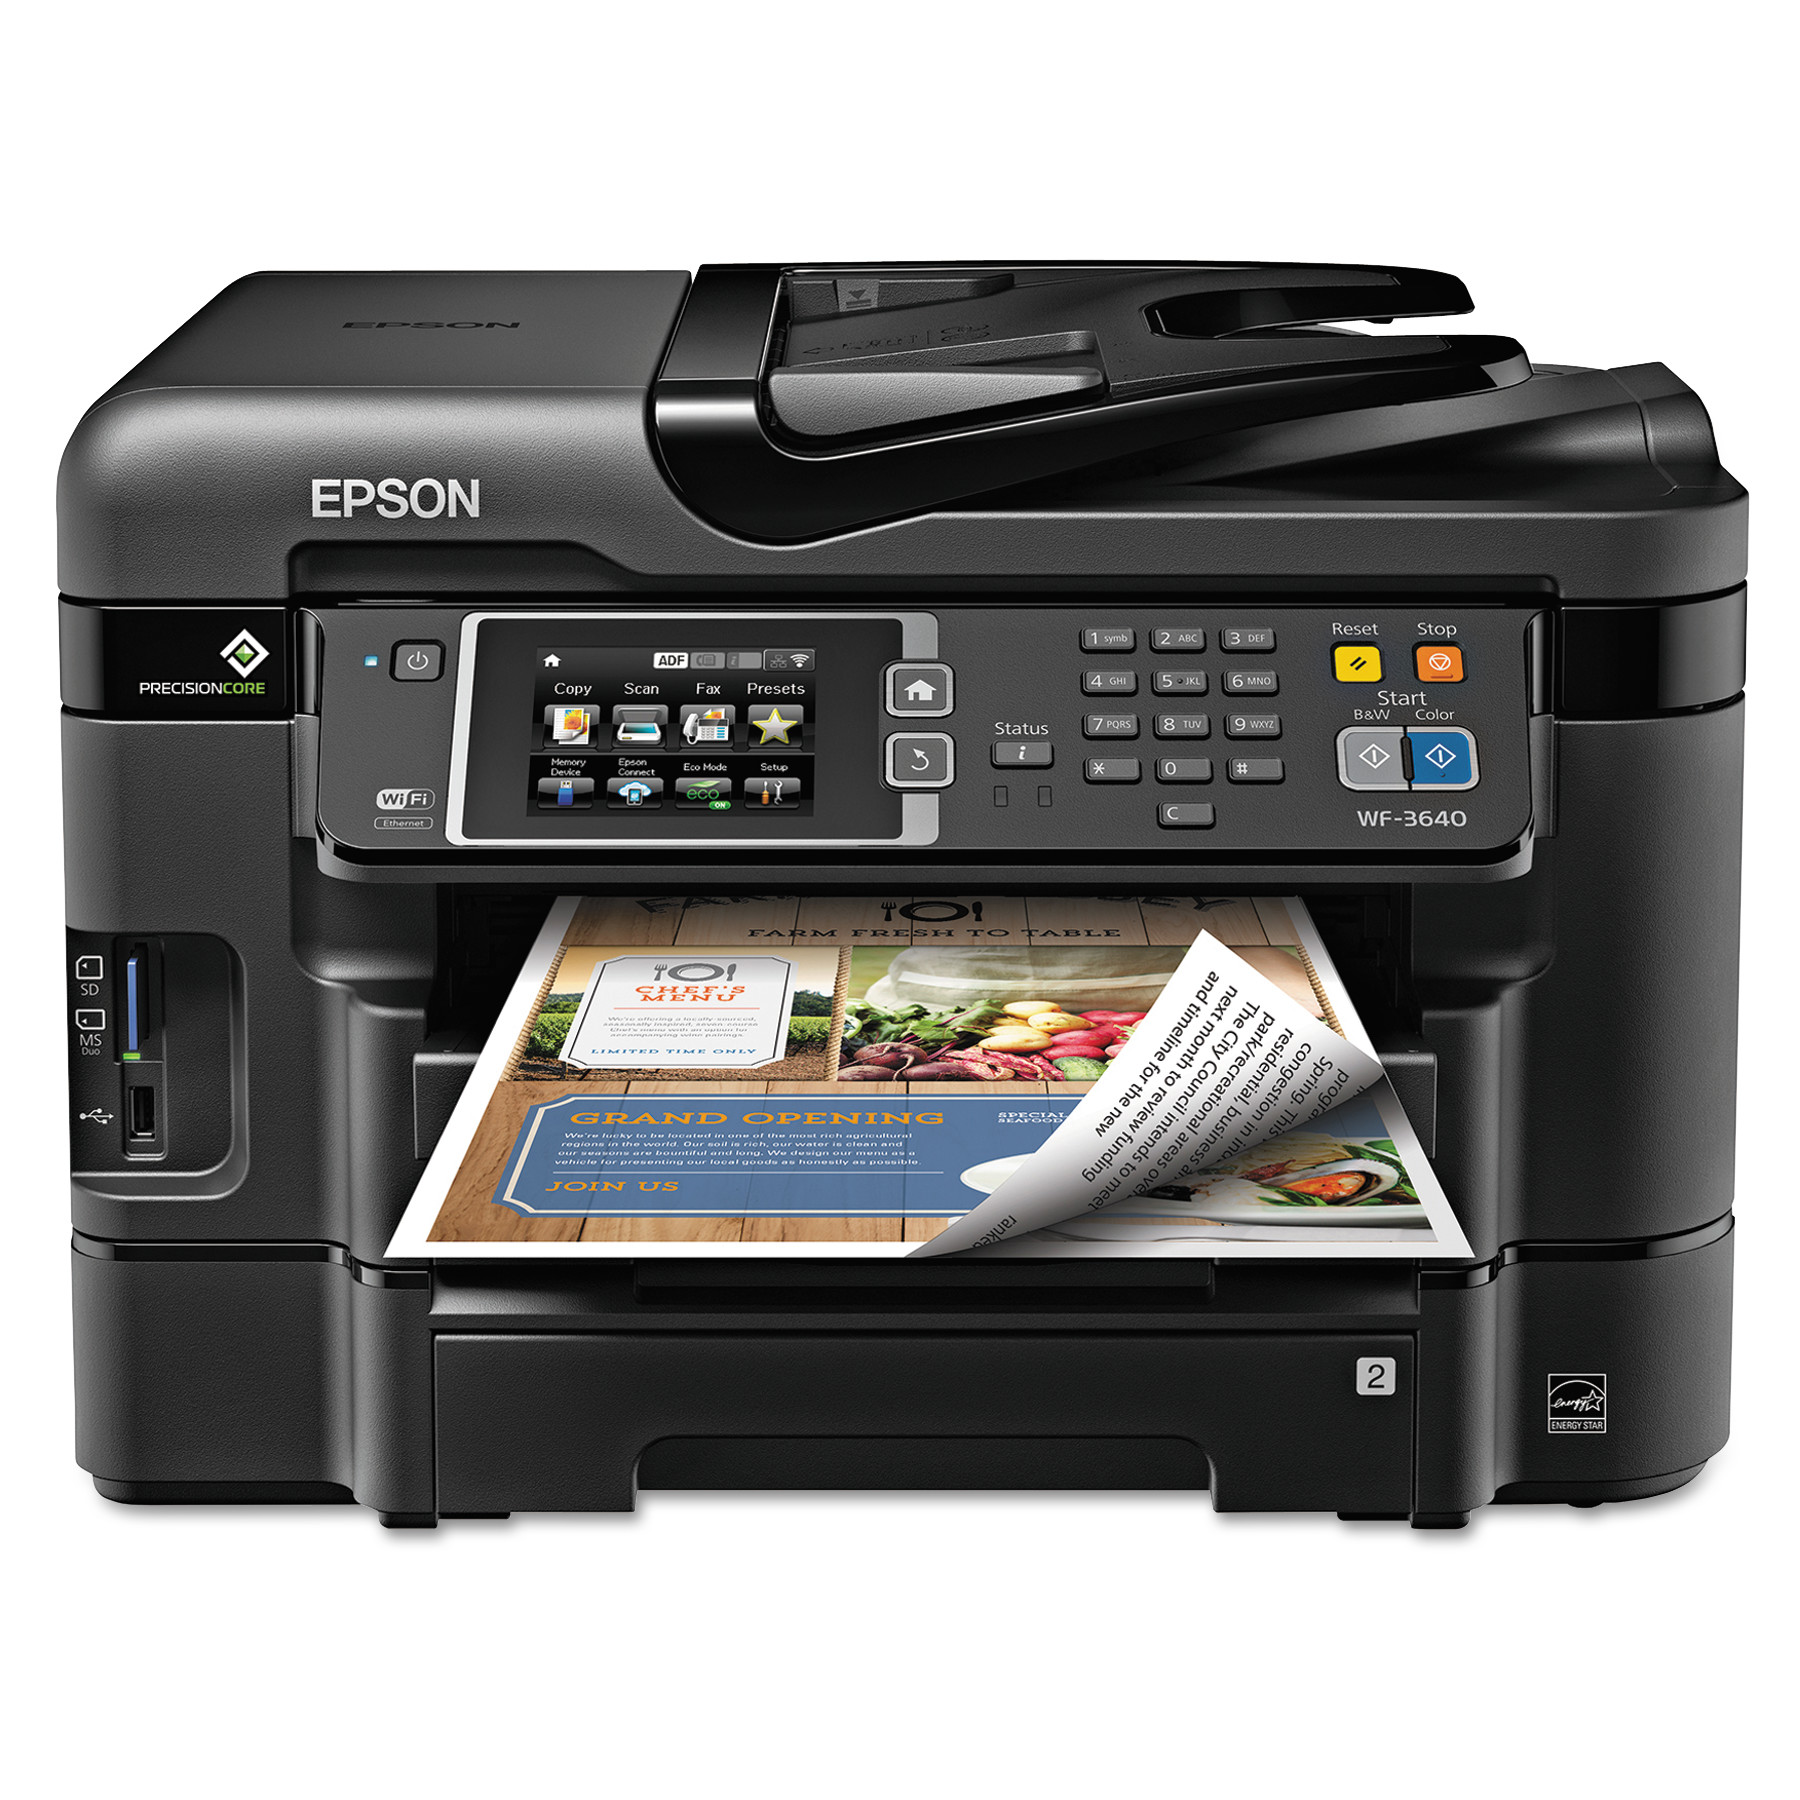 Epson-C11CD16201-WorkForce-WF-3640-All-in-One-Printer-Copier-Scanner-Fax-Machine thumbnail 2